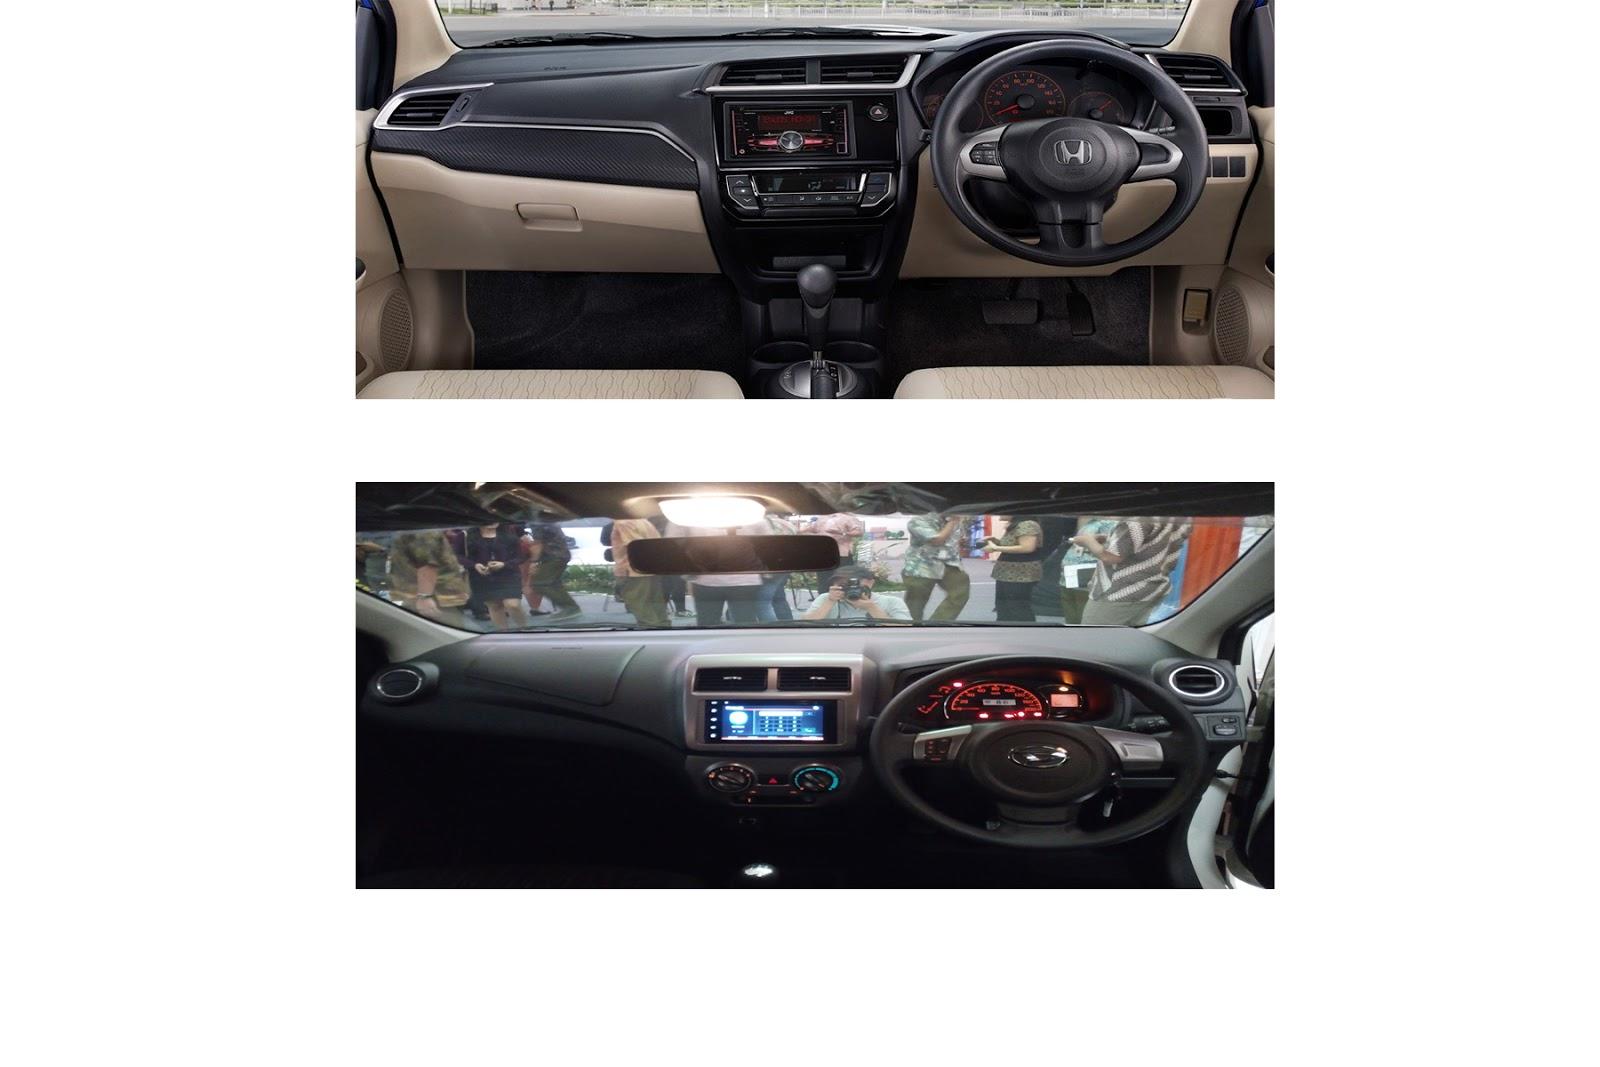 Spesifikasi New Agya Trd 2017 Harga All Kijang Innova 2.4 V A/t Diesel Lux Adu Keunggulan Dan Kelebihan Toyota Vs